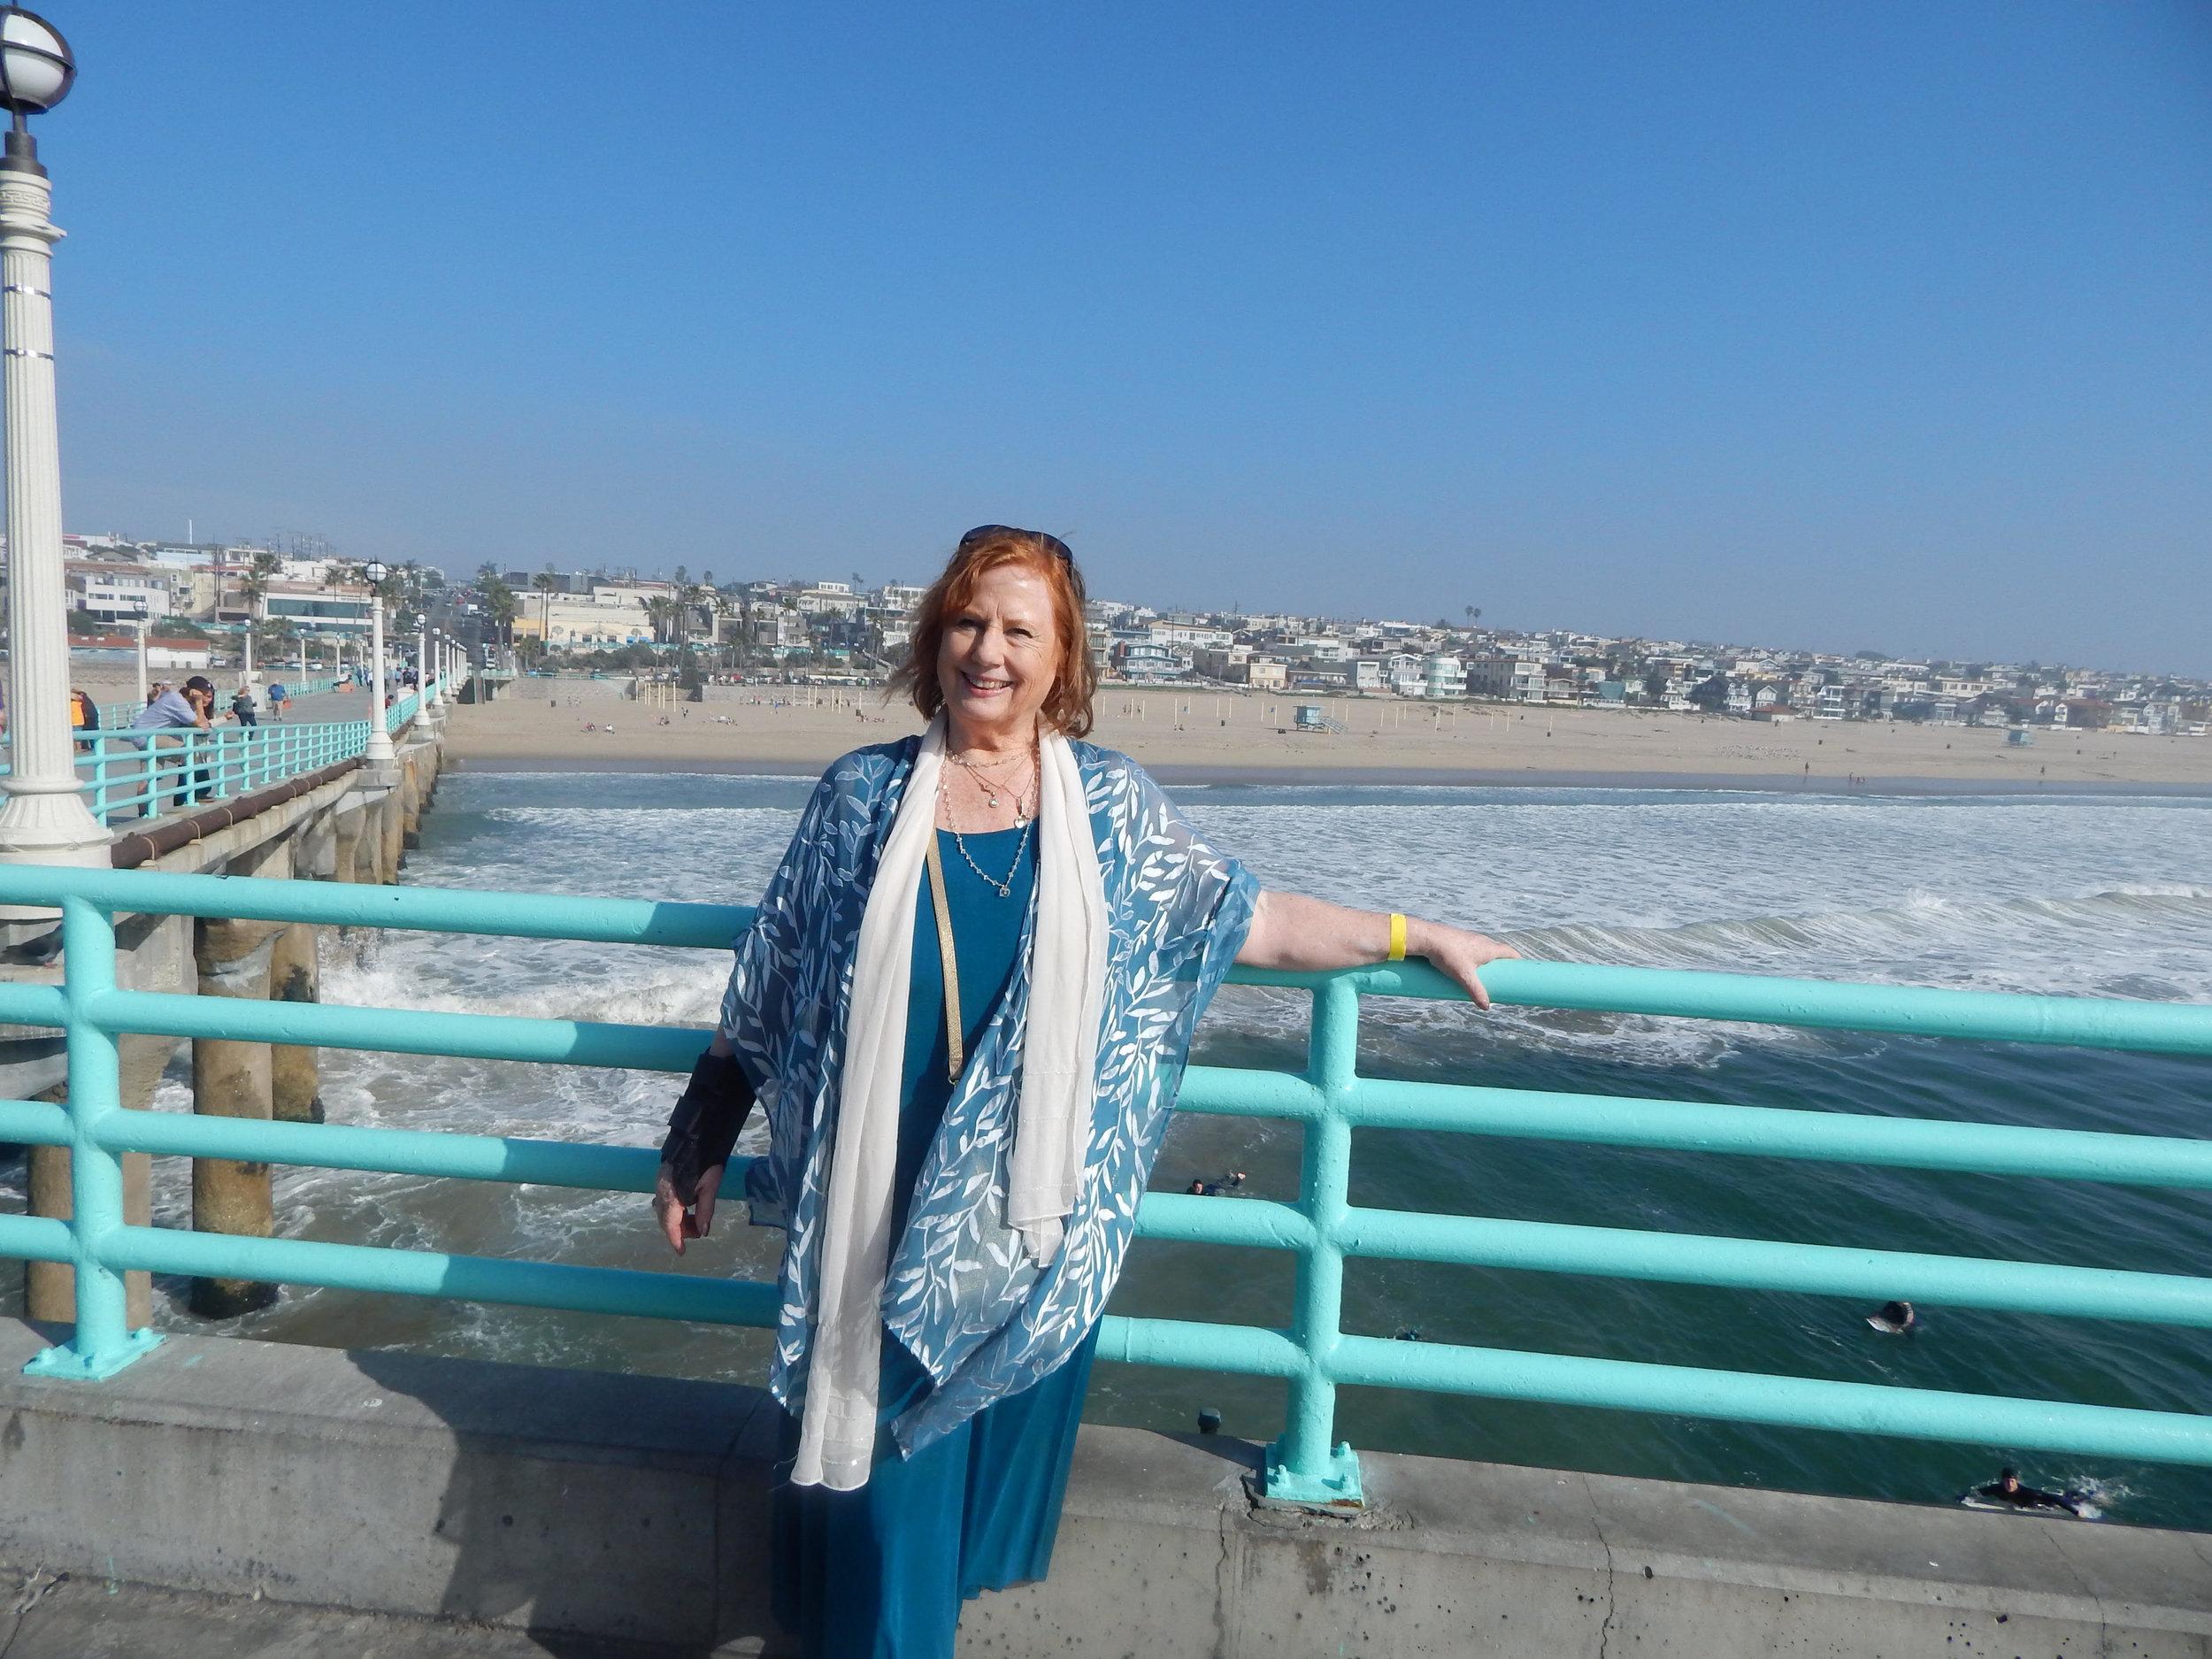 Jaya Sarada, Energy Healer, Minister and Spiritual Guide